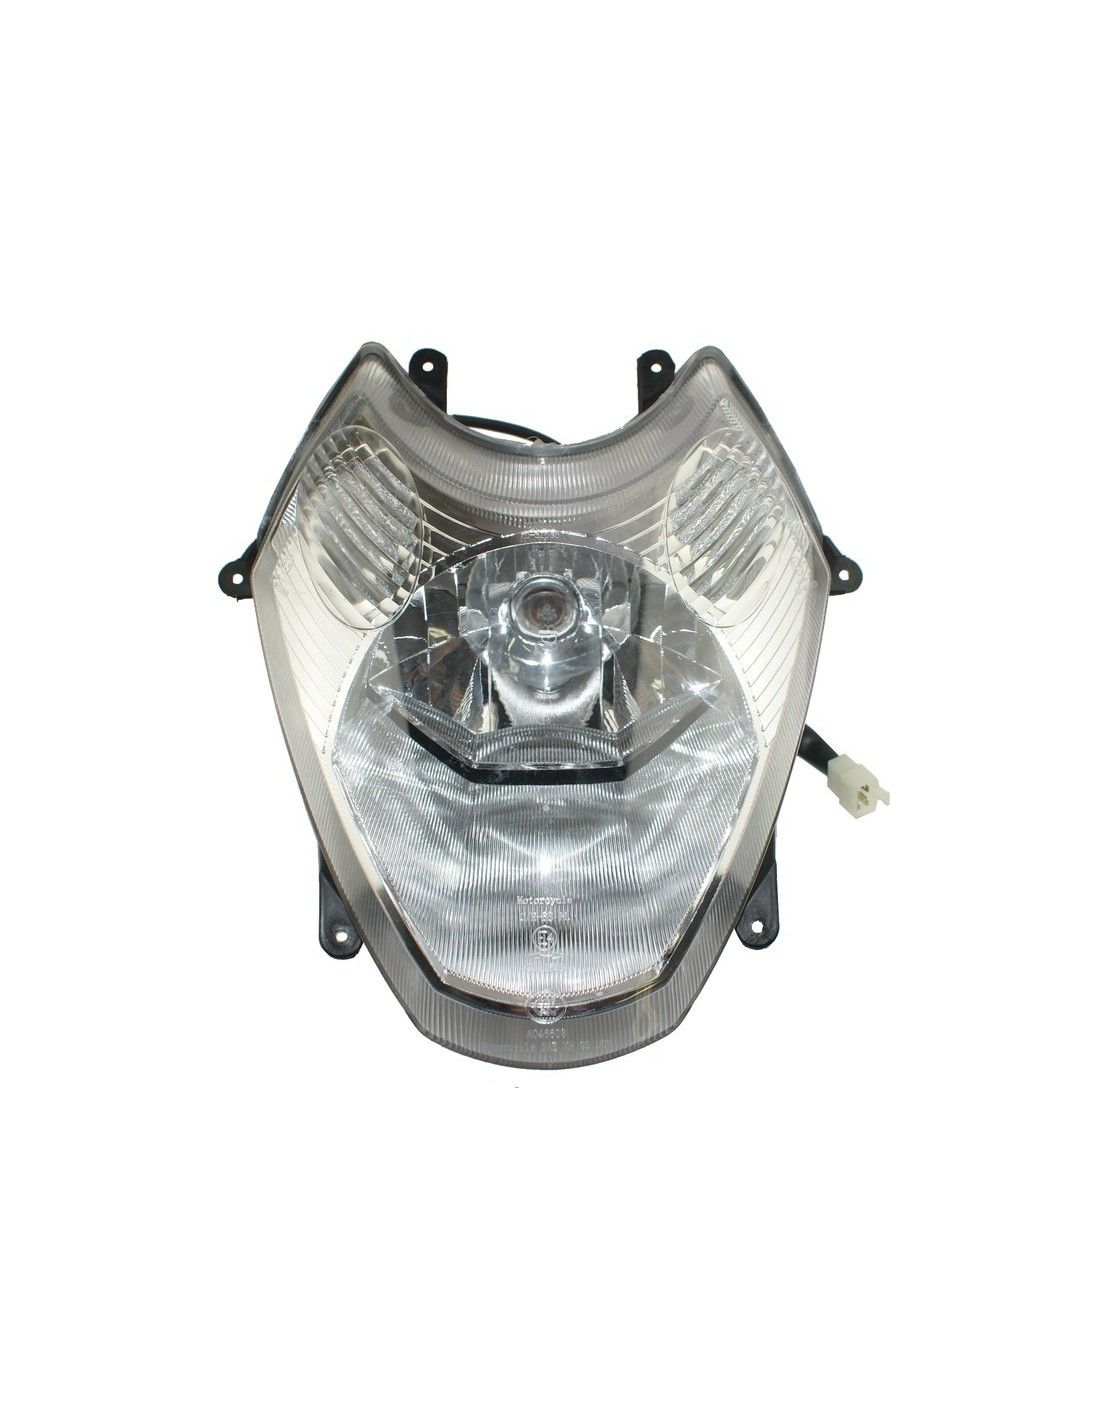 Lampa przednia Ferro 604